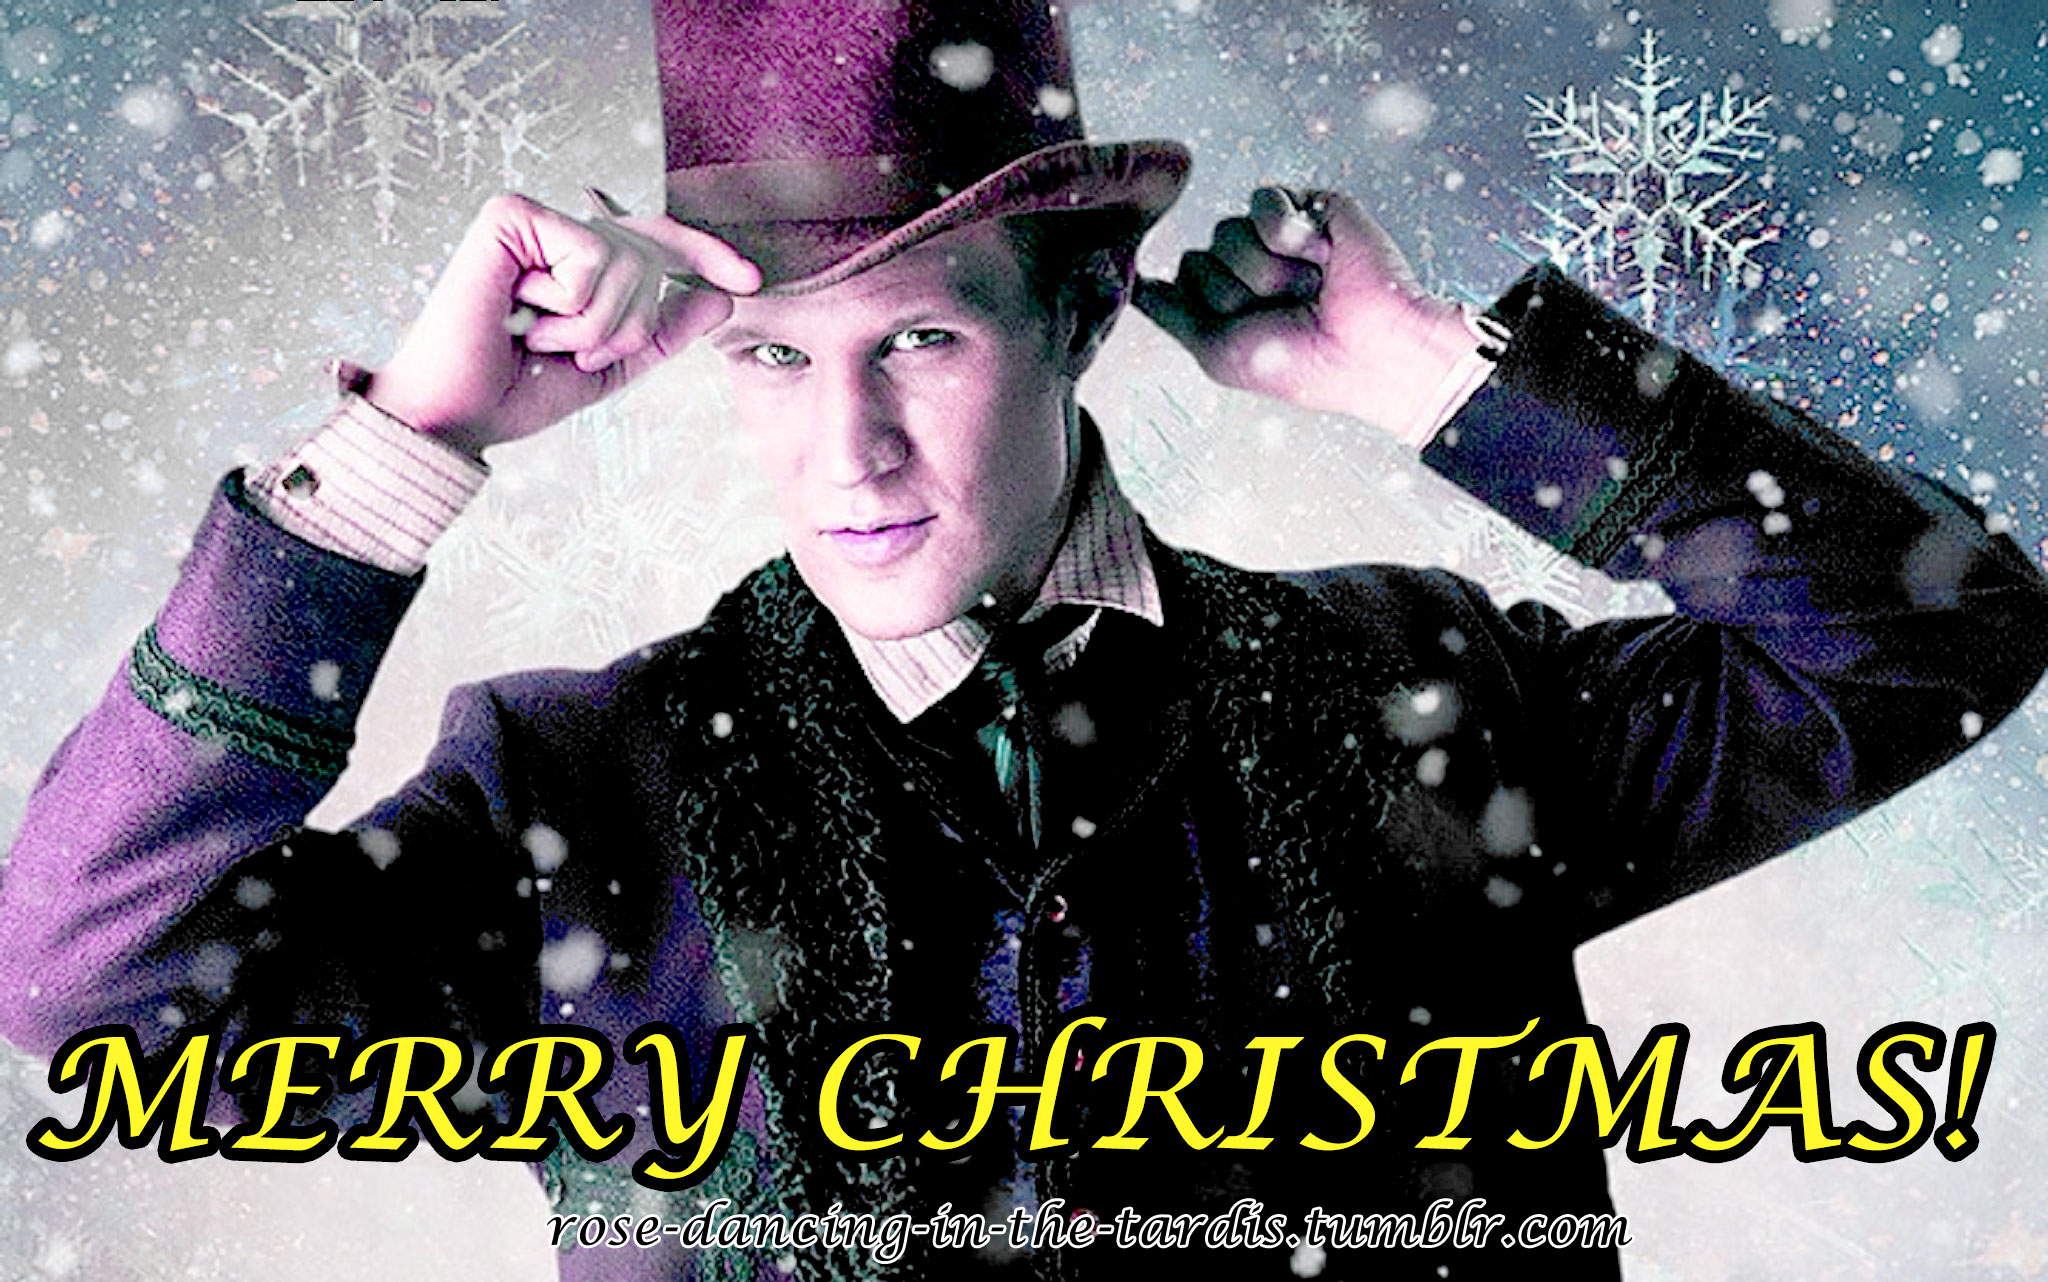 Merry Christmas Whovians!